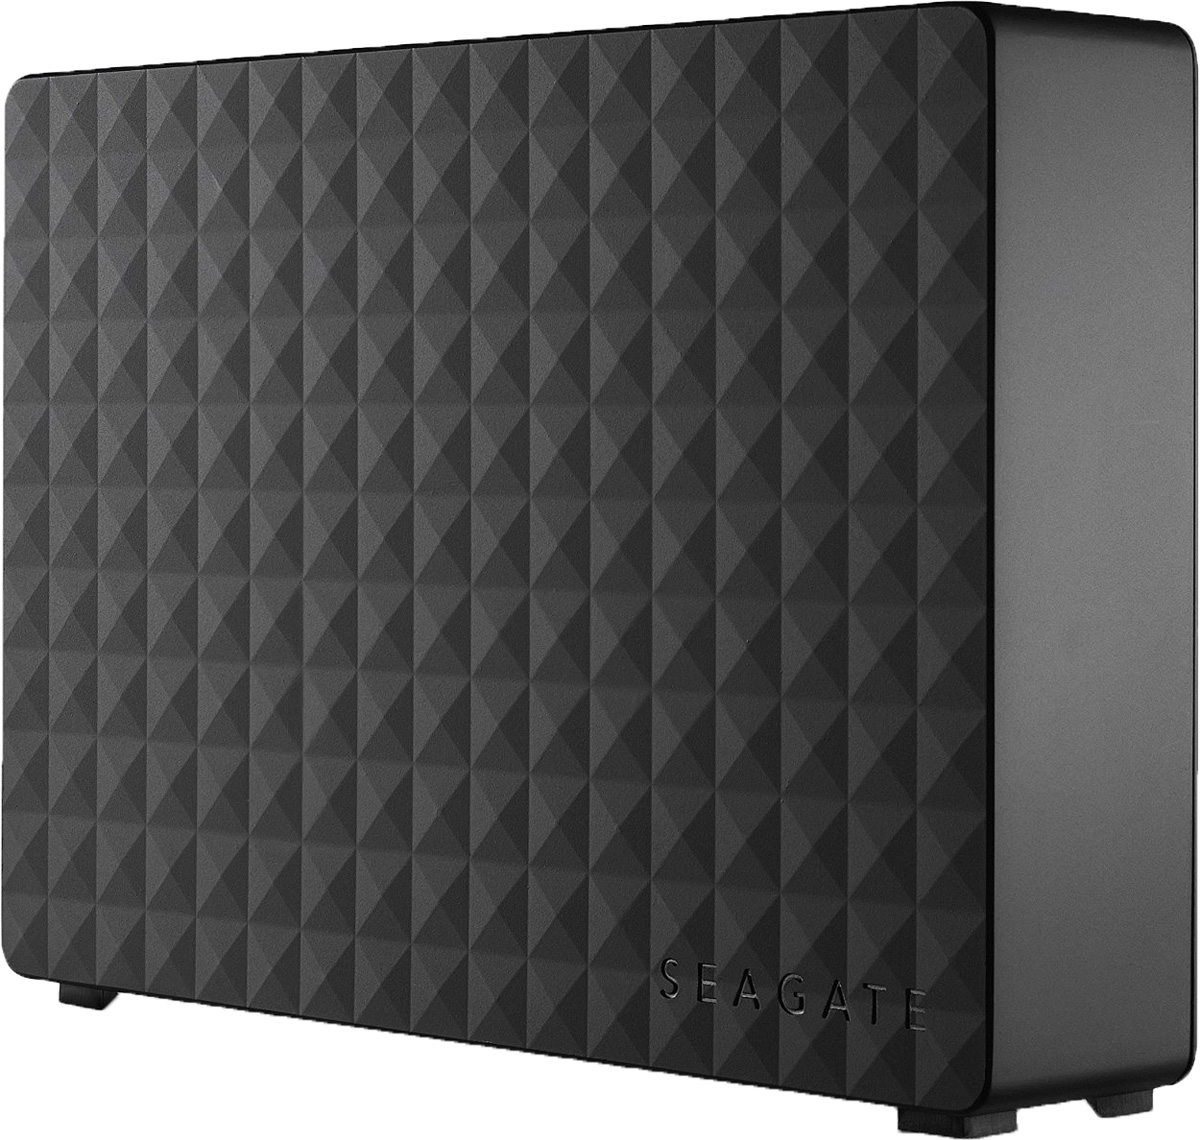 Seagate Expansion Desk 3TB USB 3.0 внешний жесткий диск (STEB3000200) - Носители информации